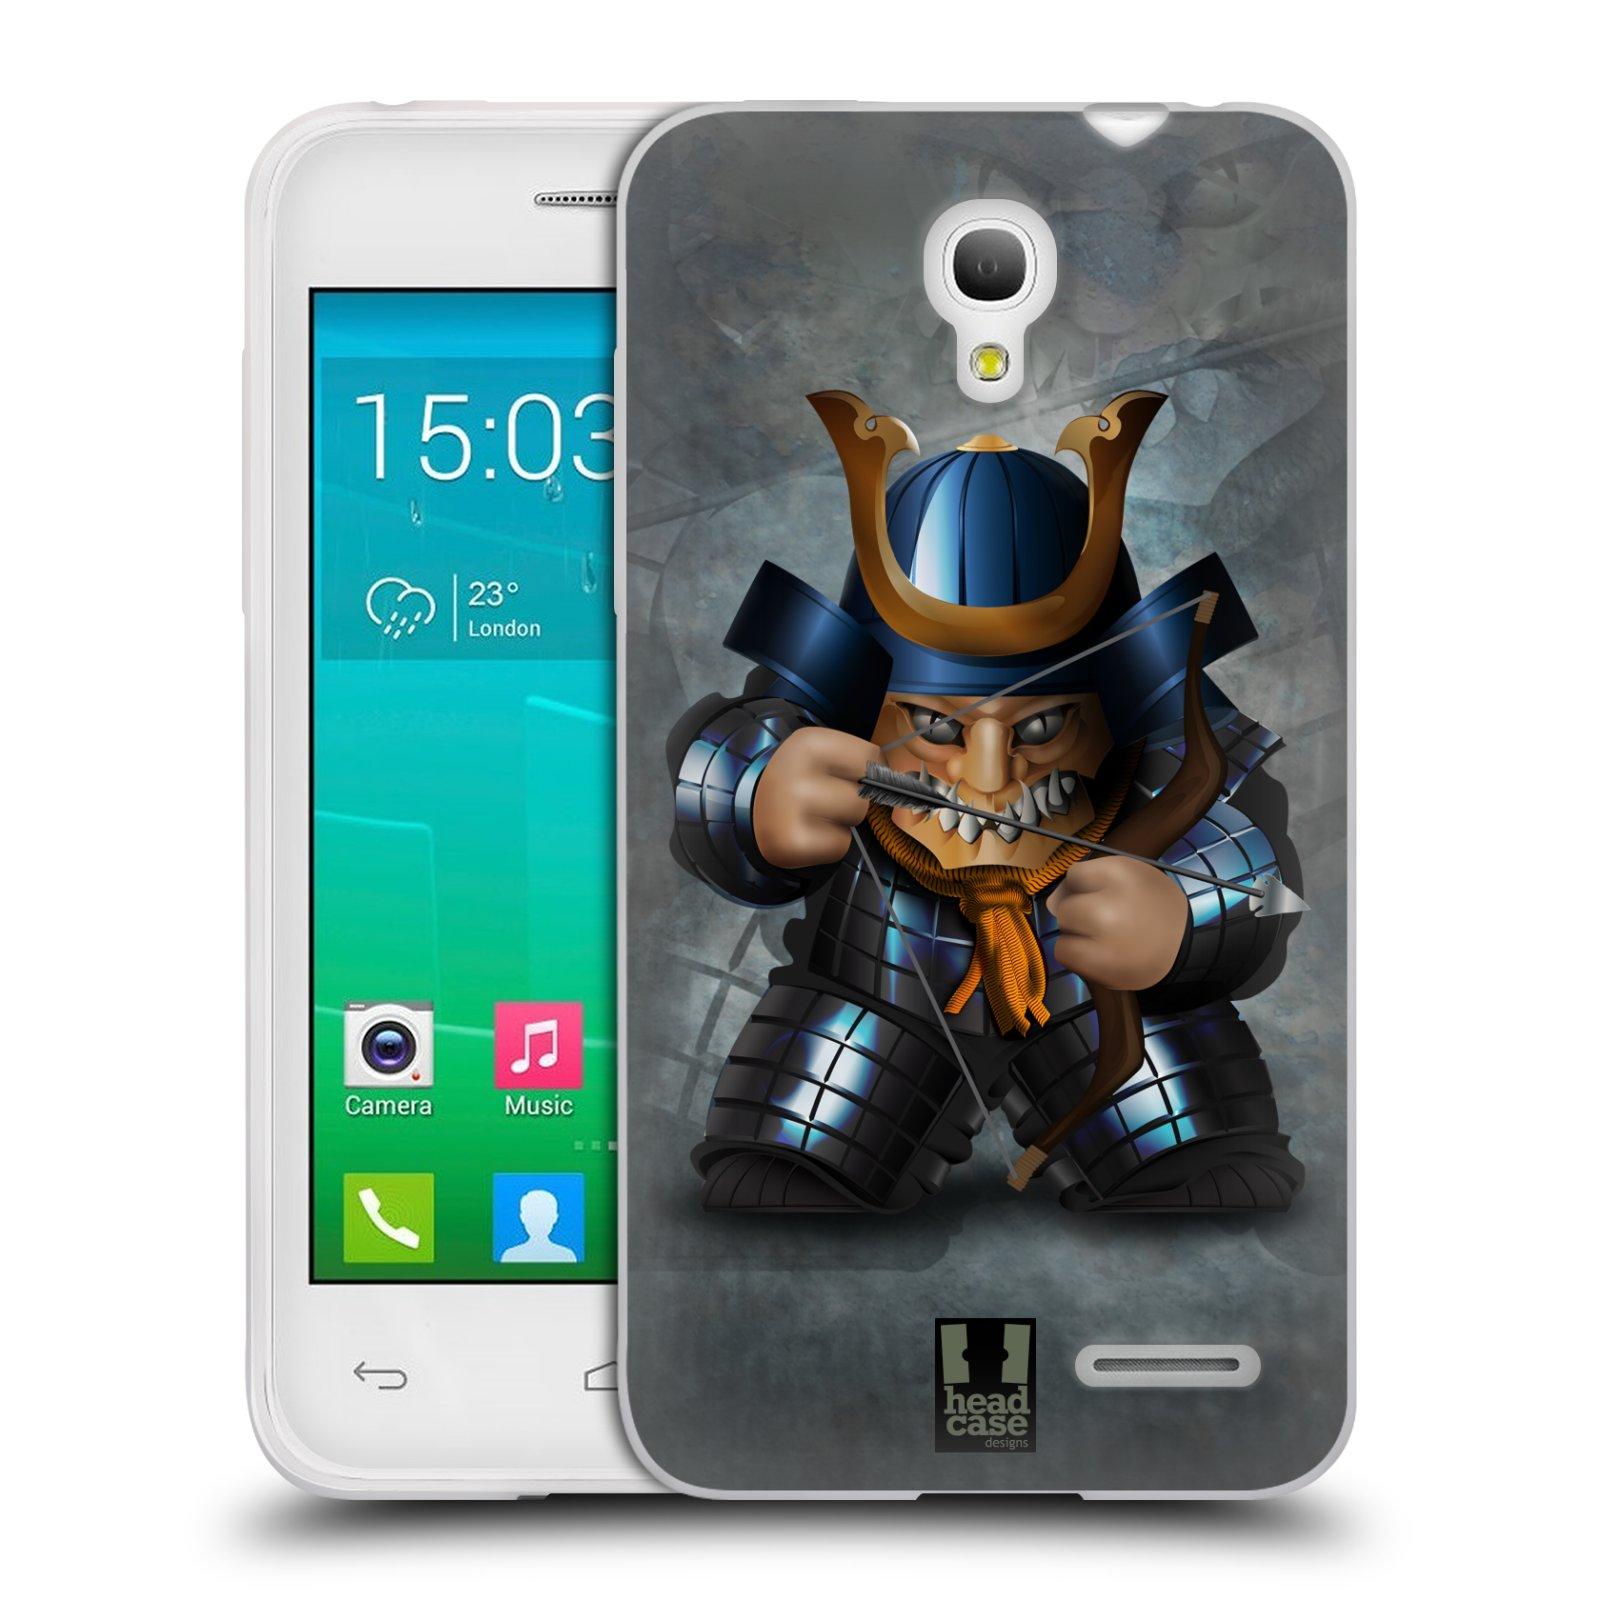 HEAD CASE silikonový obal na mobil Alcatel POP S3 OT-5050Y vzor Malí bojovníci SHOGUN STŘELEC